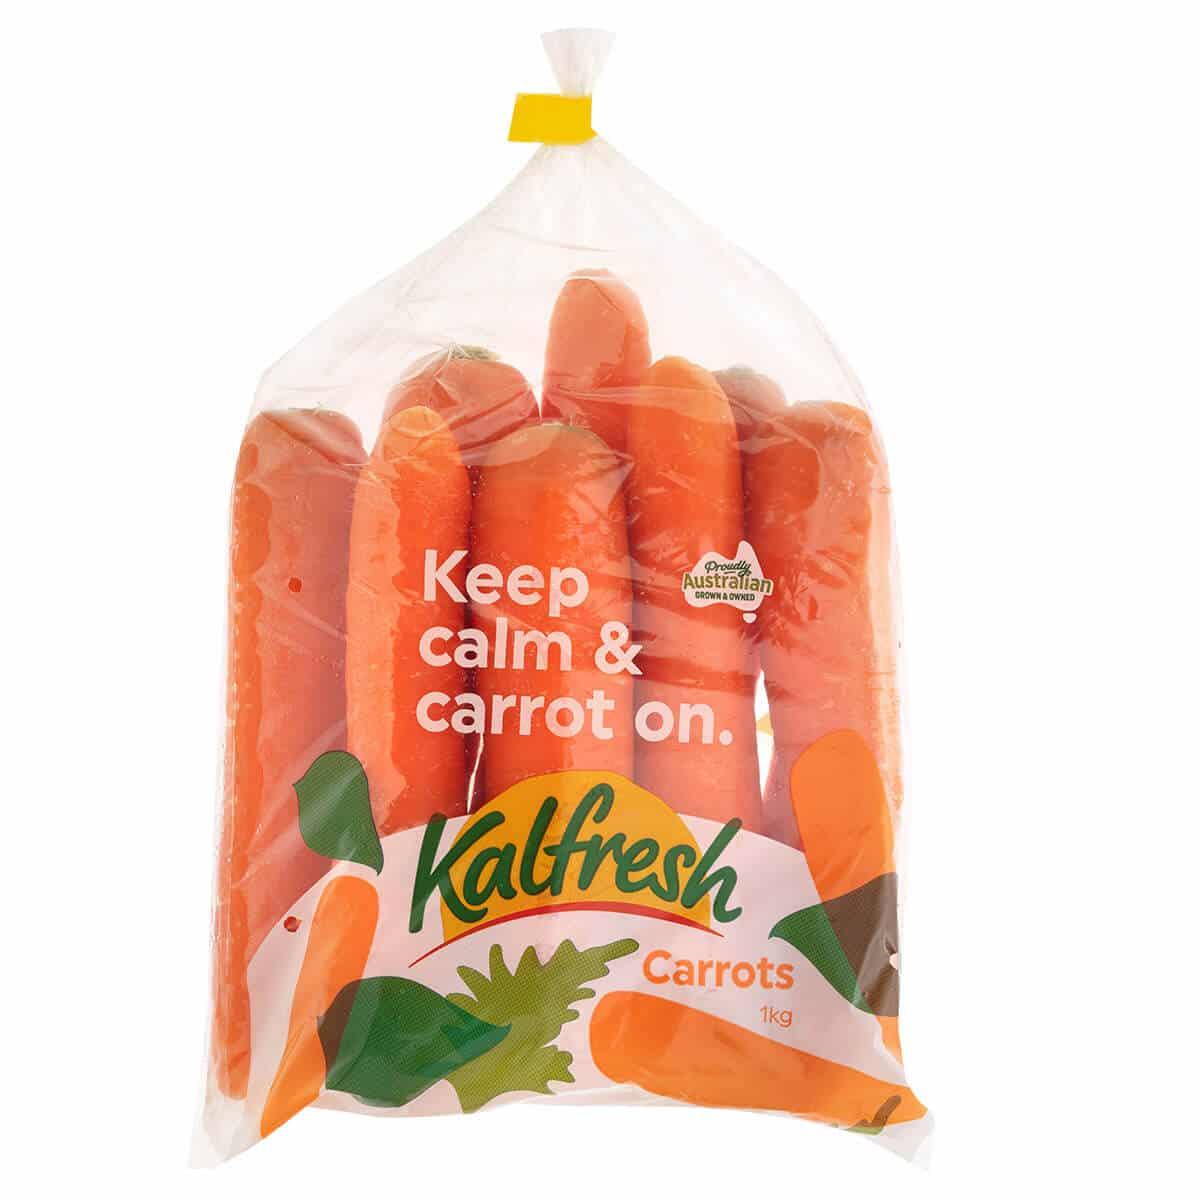 kalfresh-carrots